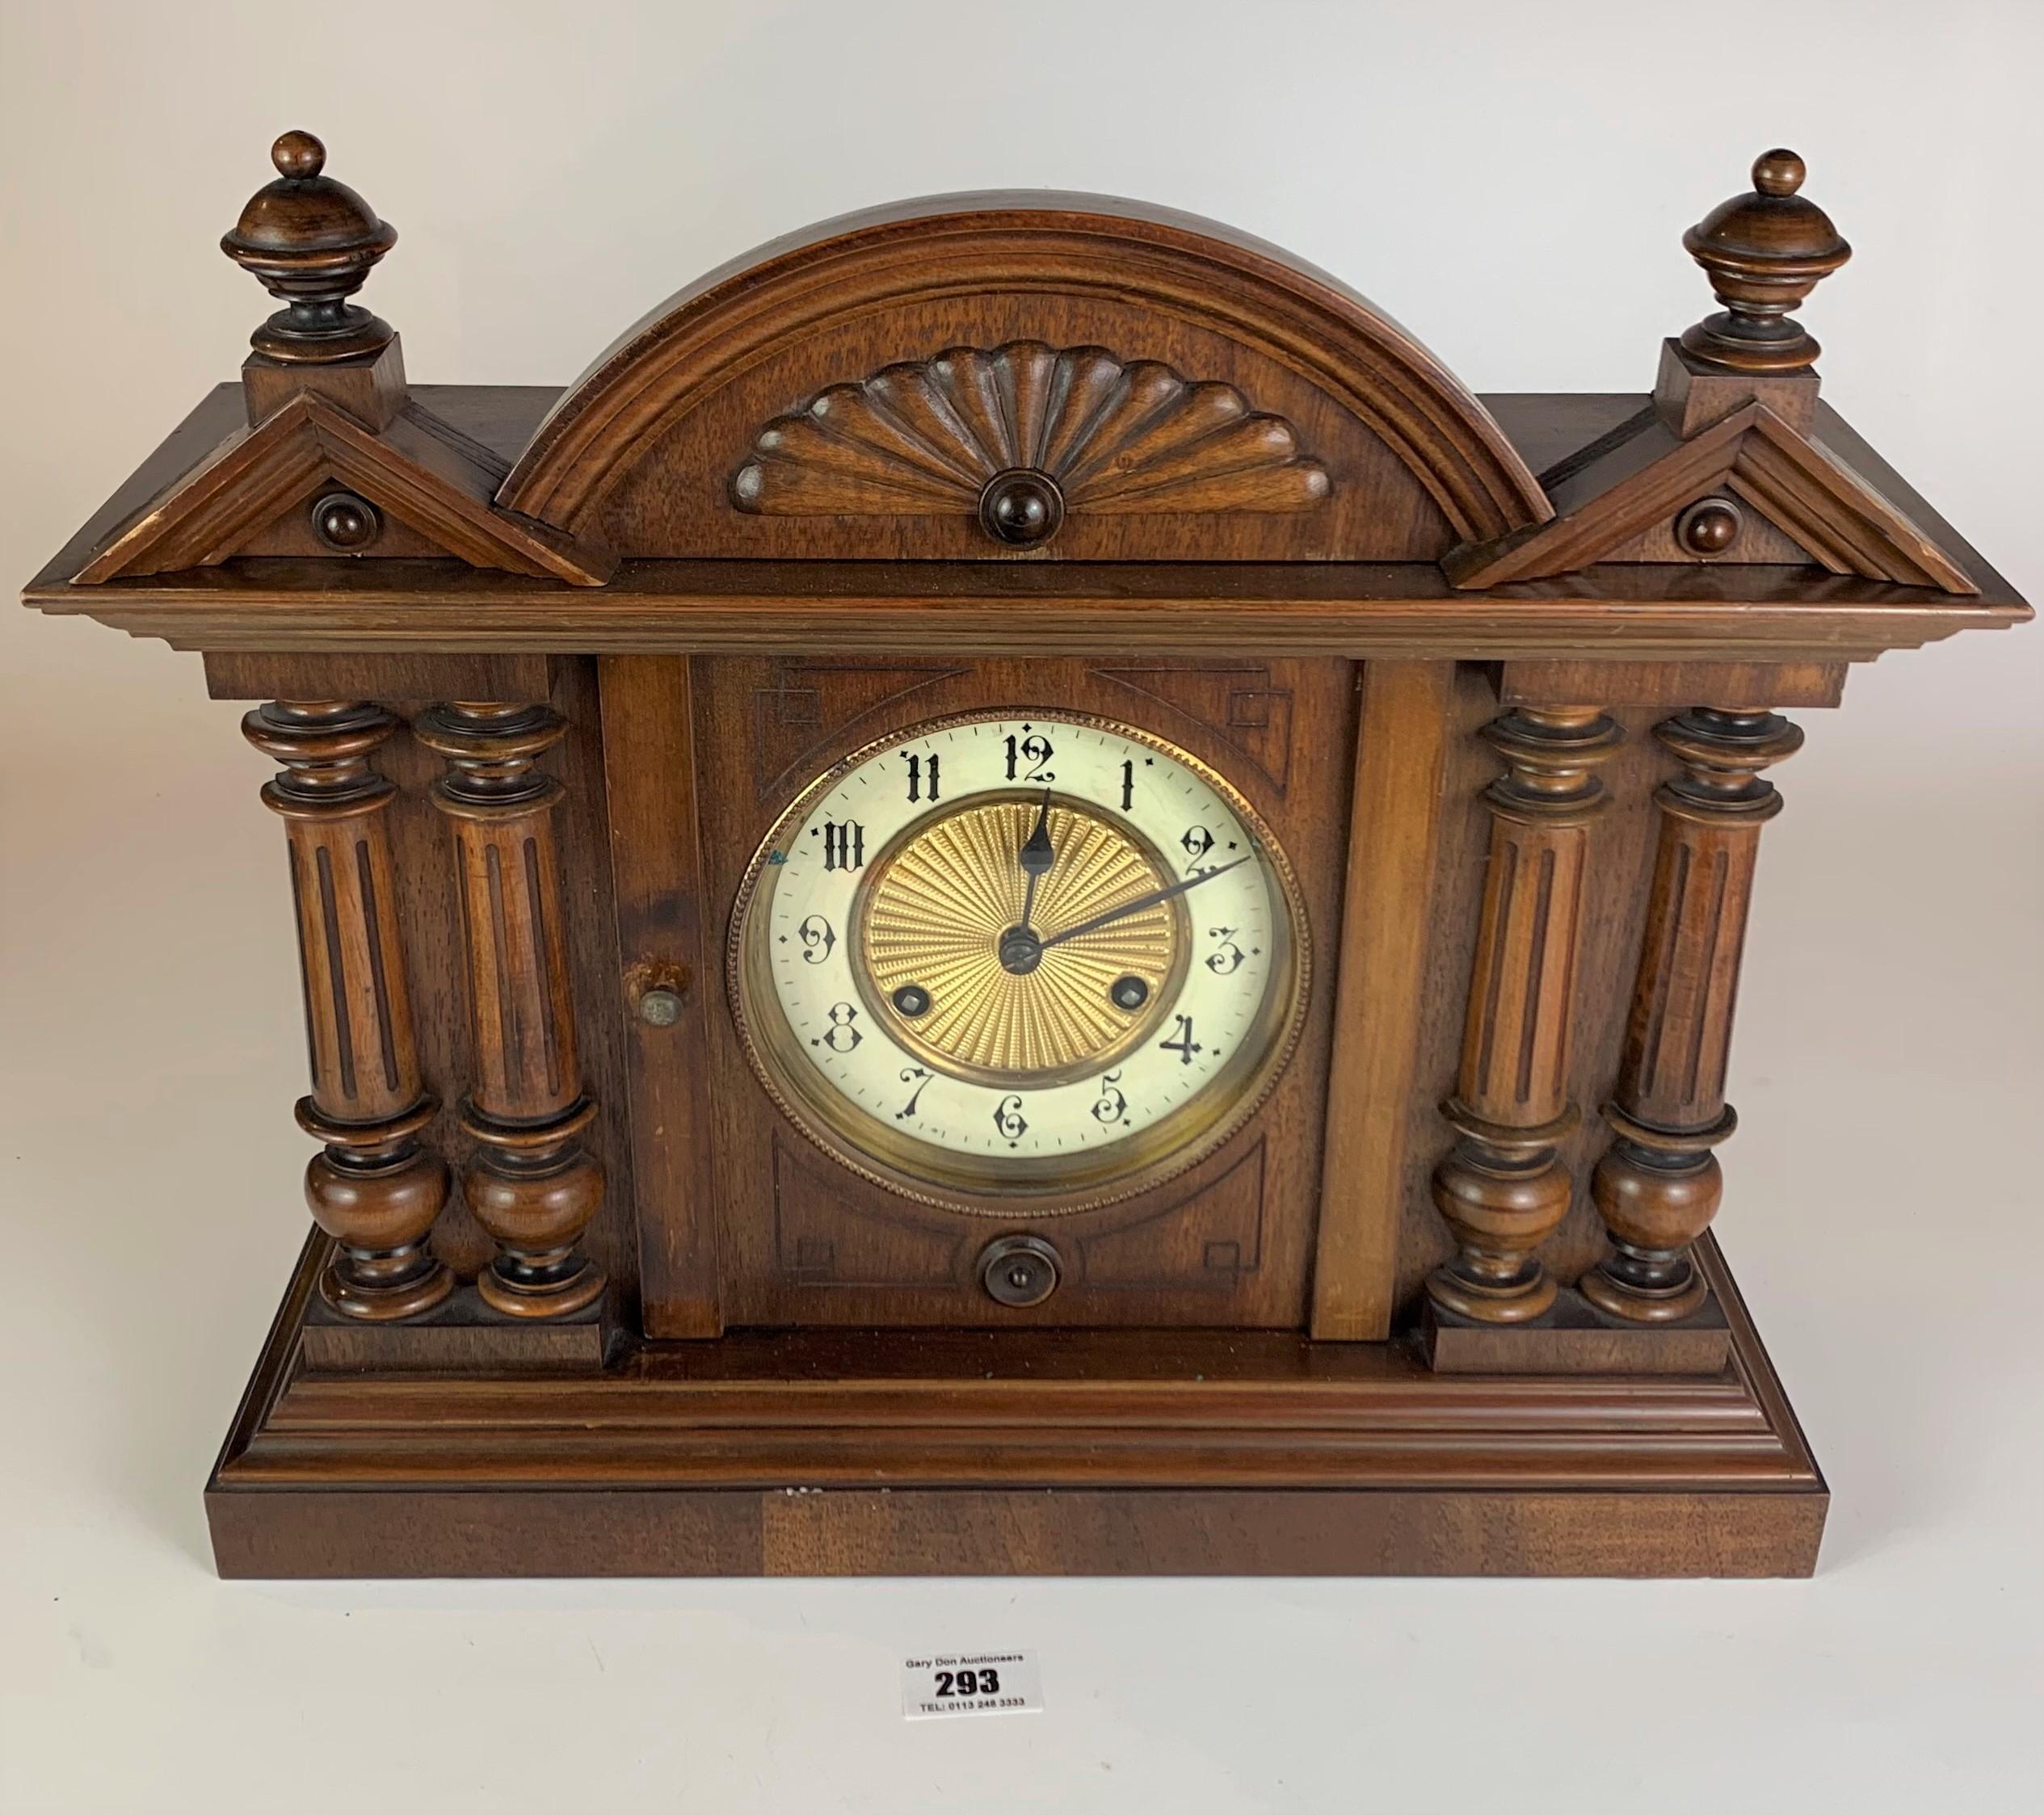 "Antique mantle clock, 14.5"" high, 16.5"" wide"